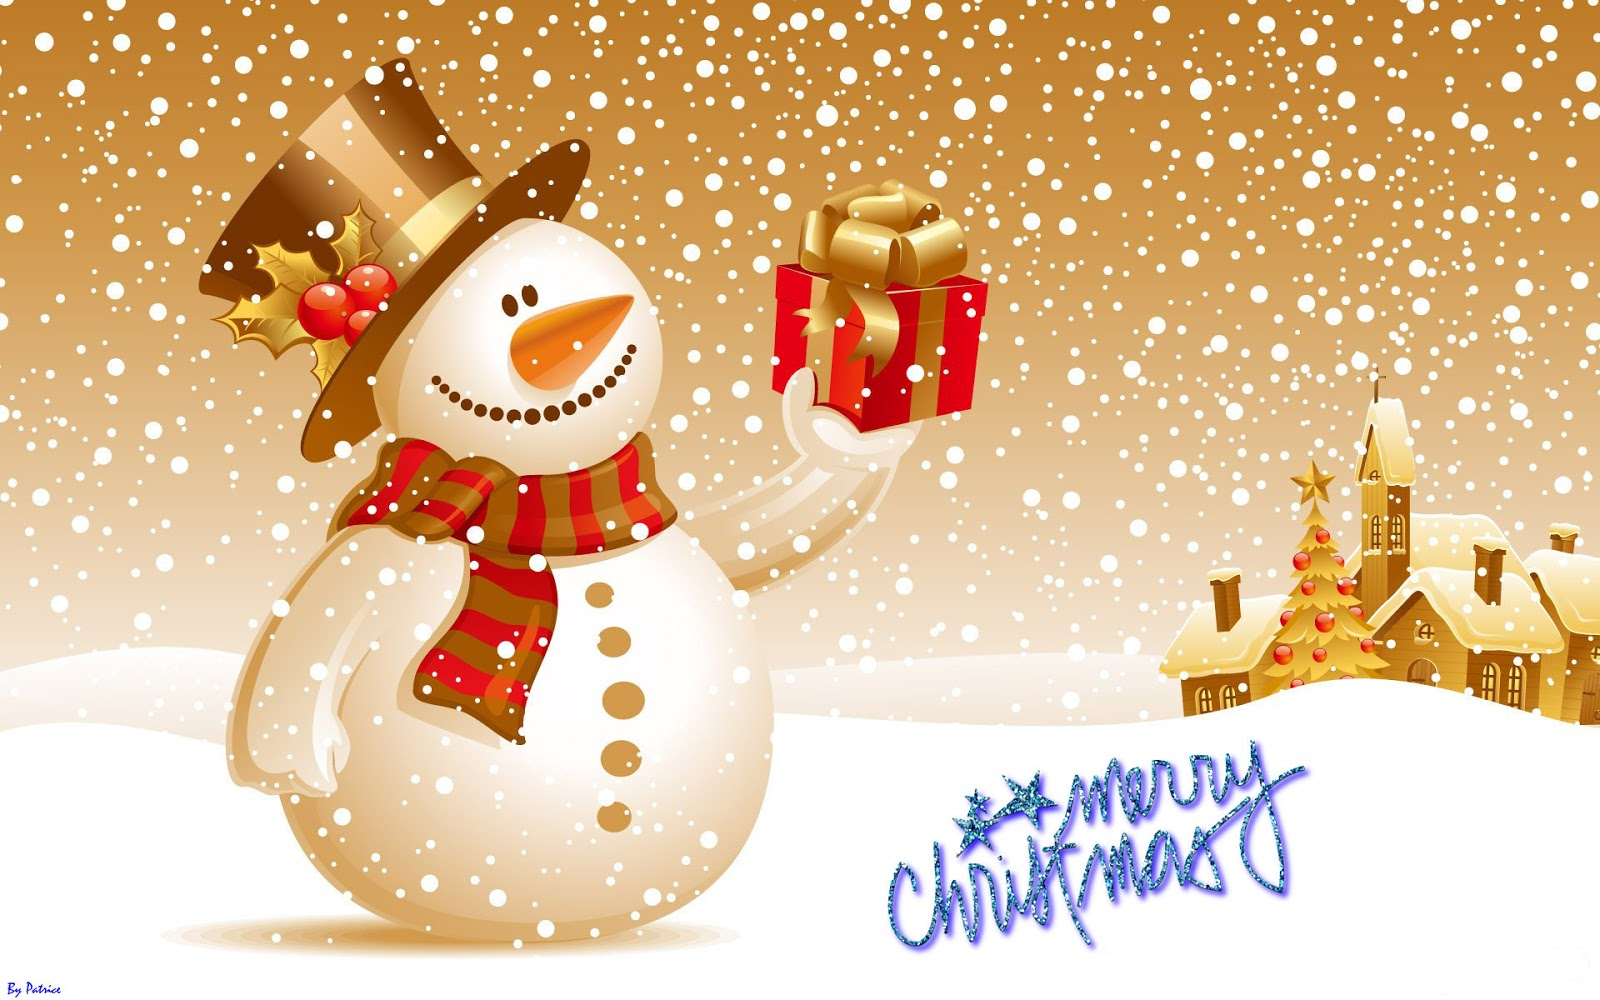 Merry Christmas 2014 | Pinoy Fitness